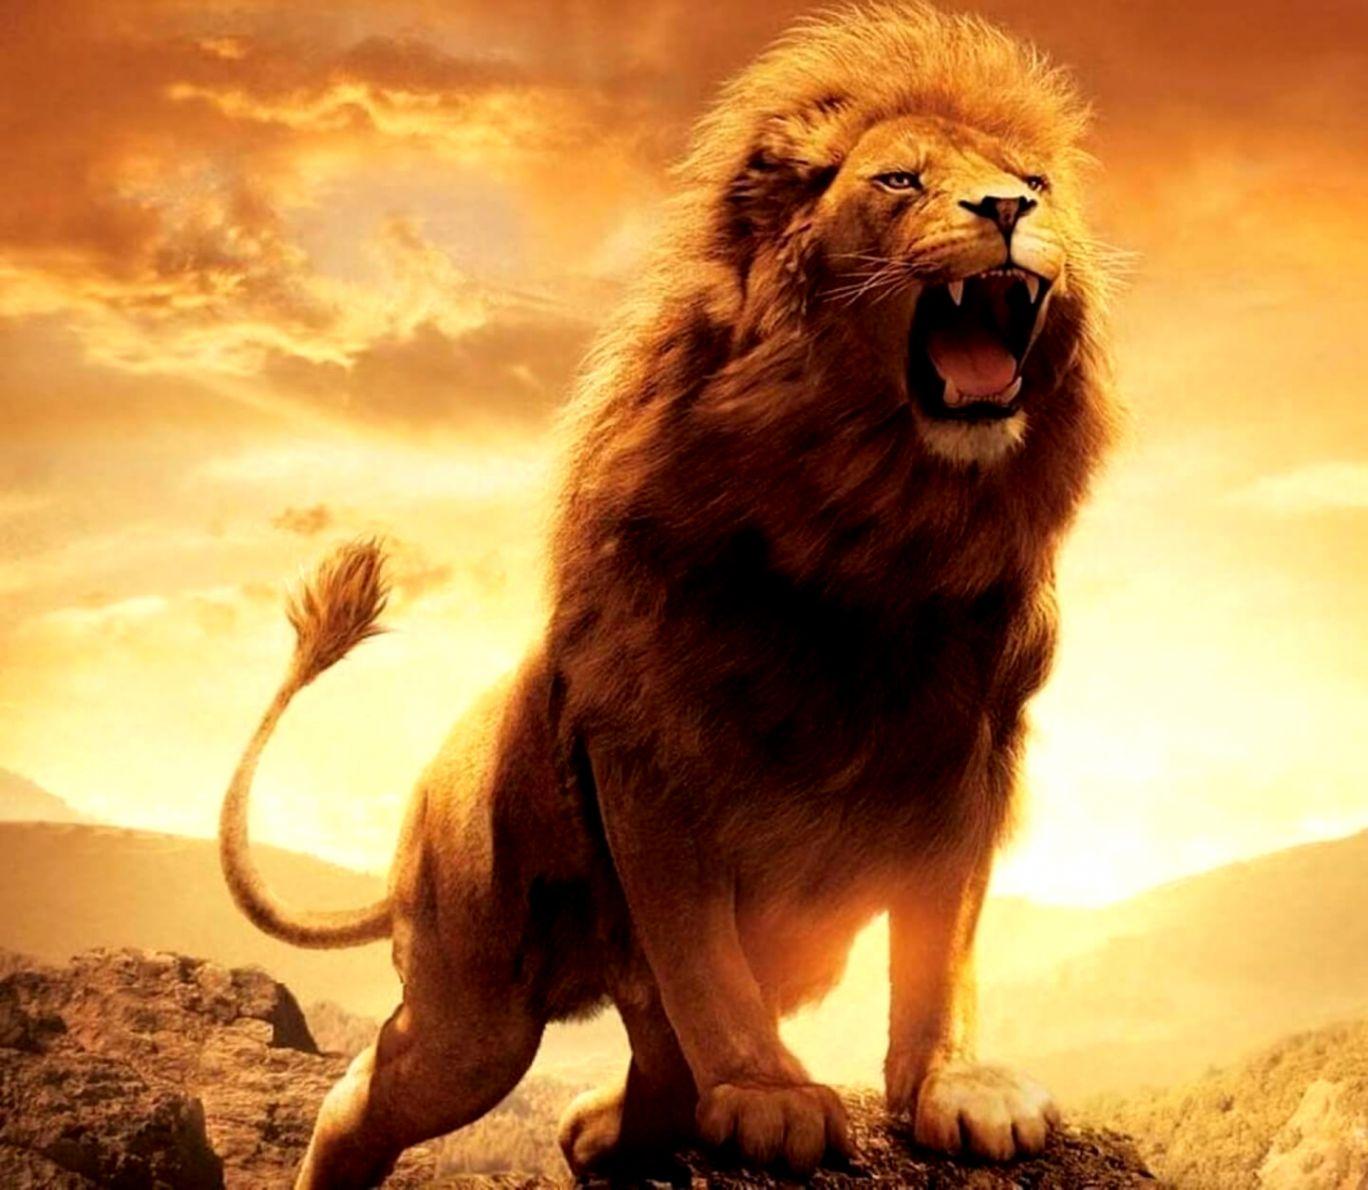 Lion Man Hd Wallpaper Wallpapers Ninja